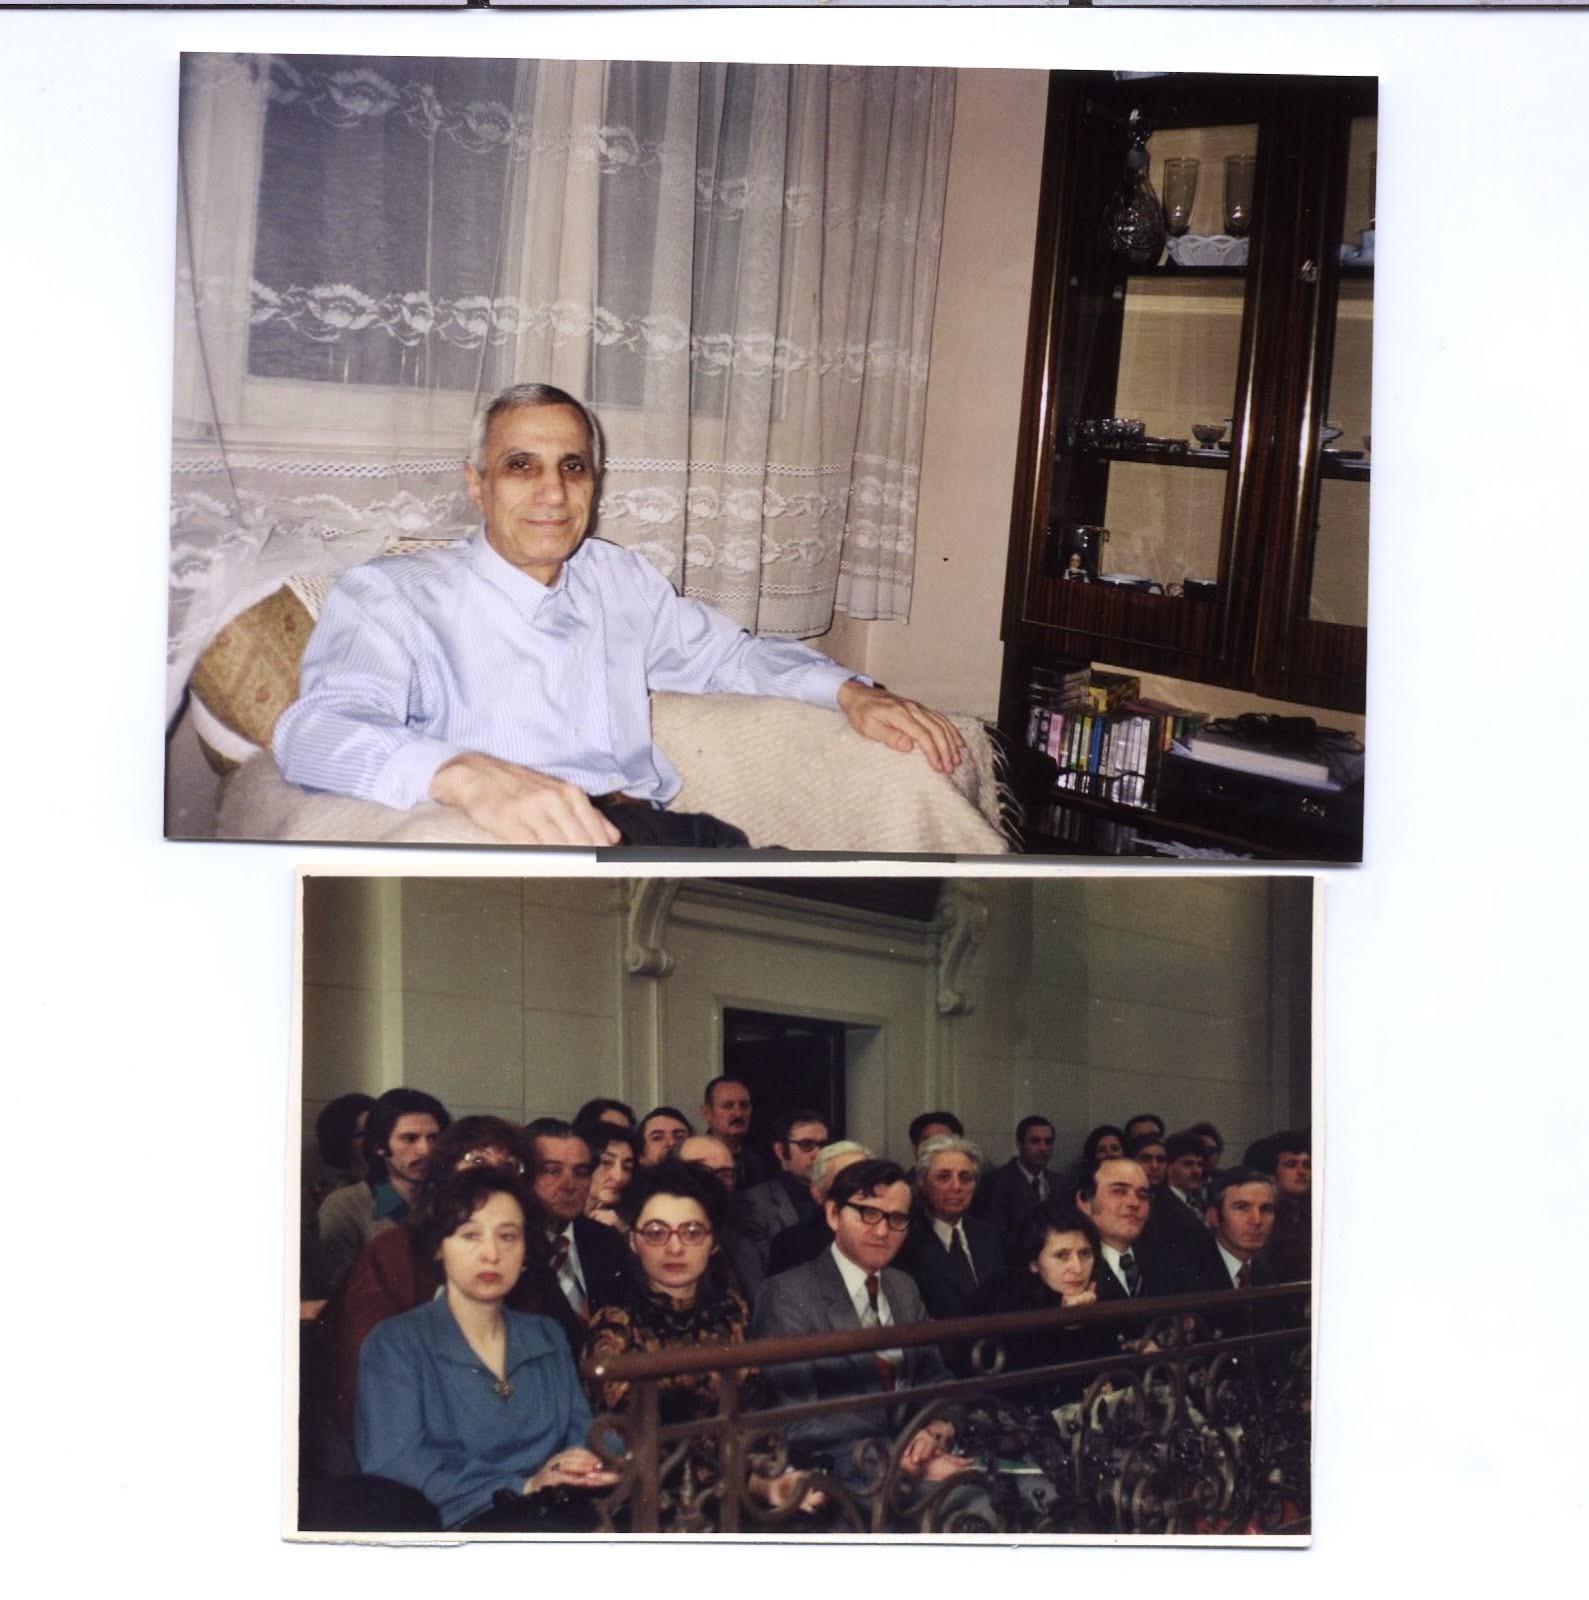 Nicolae Marcov, Anisoara Draga-Ducaru, Mihaila Ieronim, Gaby Marinoschi, Aula Academiei